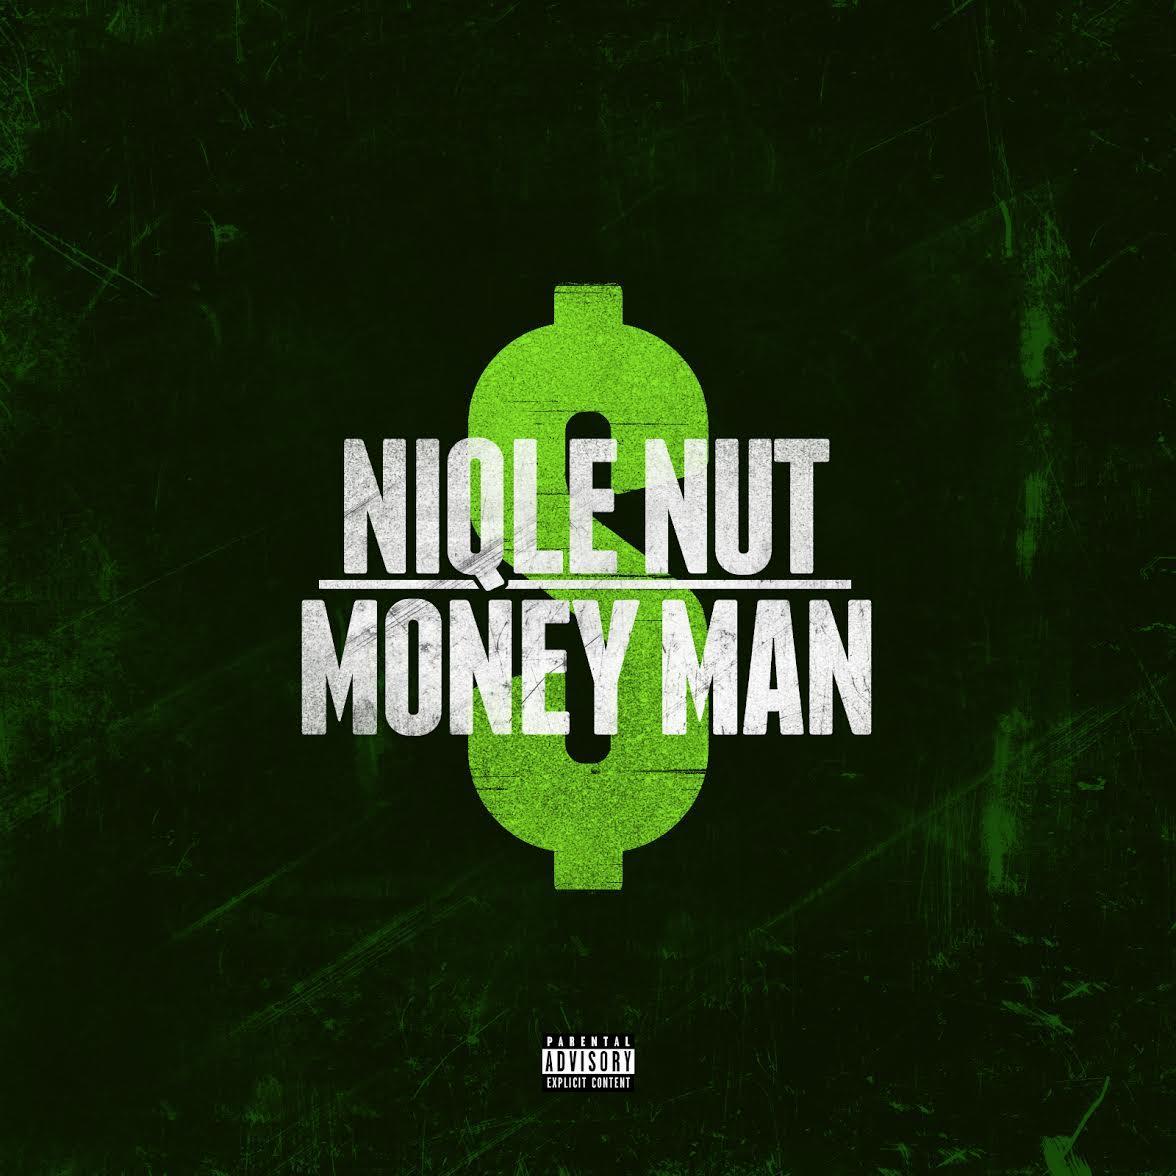 niqle nut money man